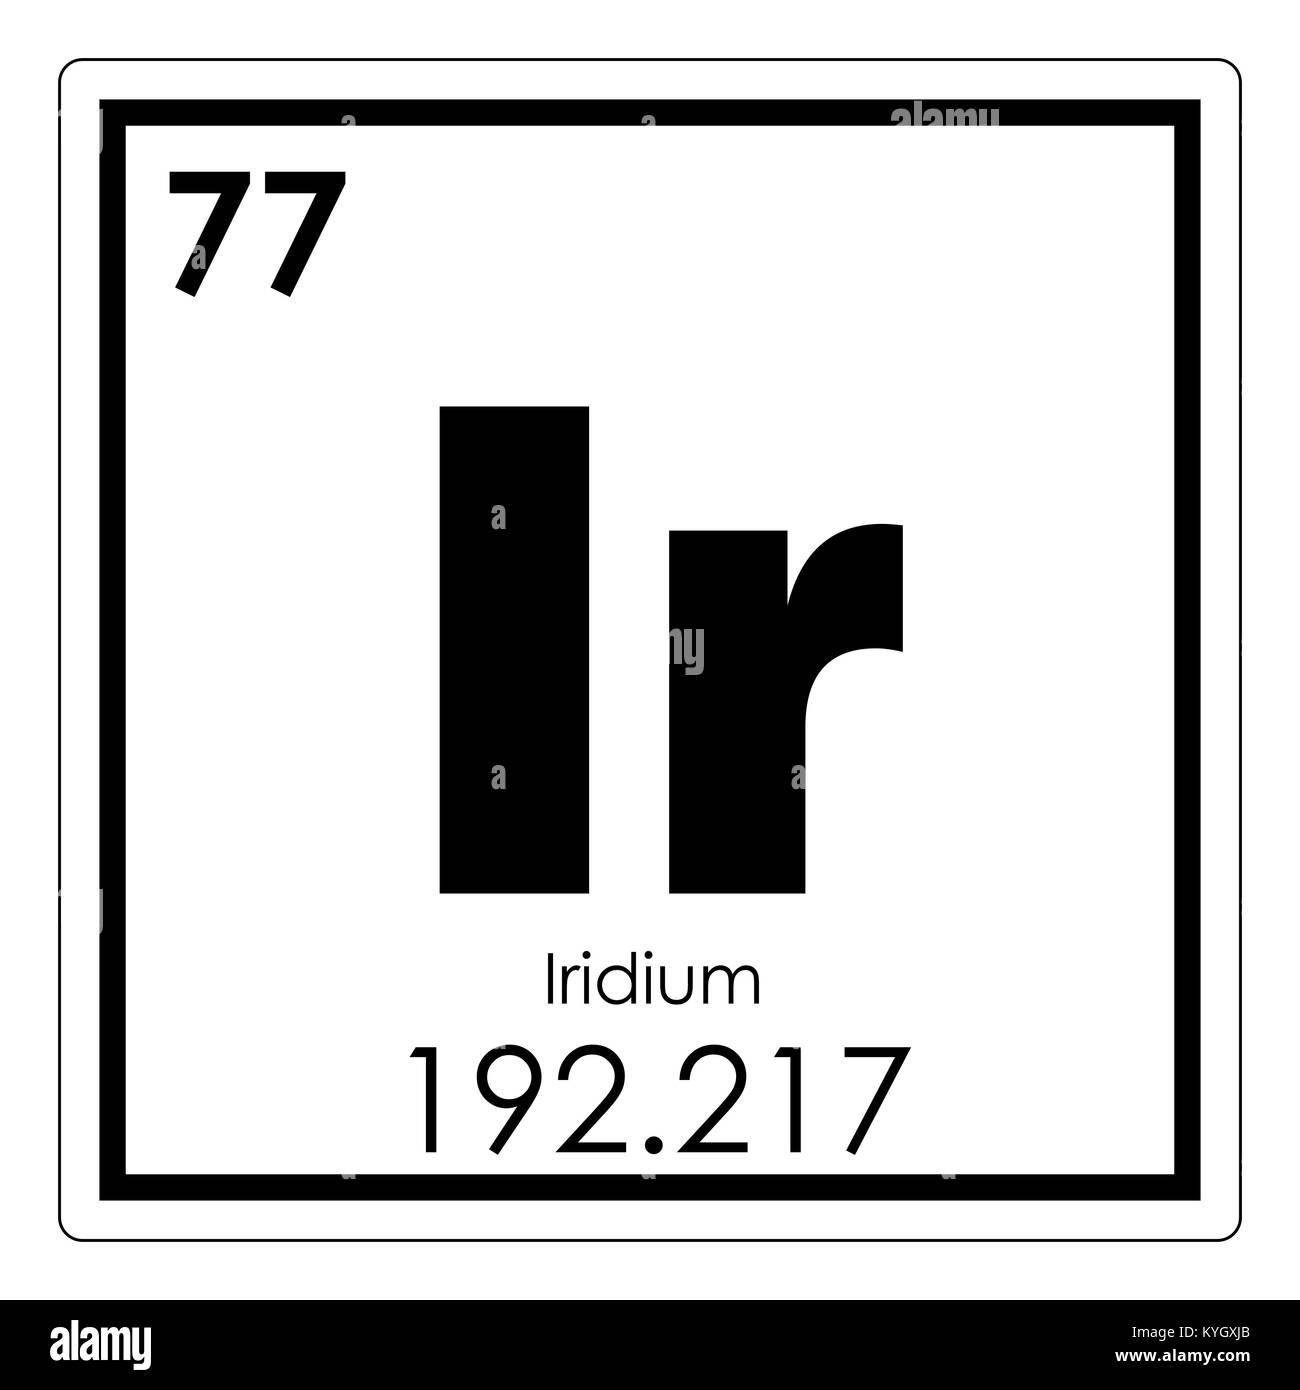 Iridium chemical element periodic table science symbol Stock Photo